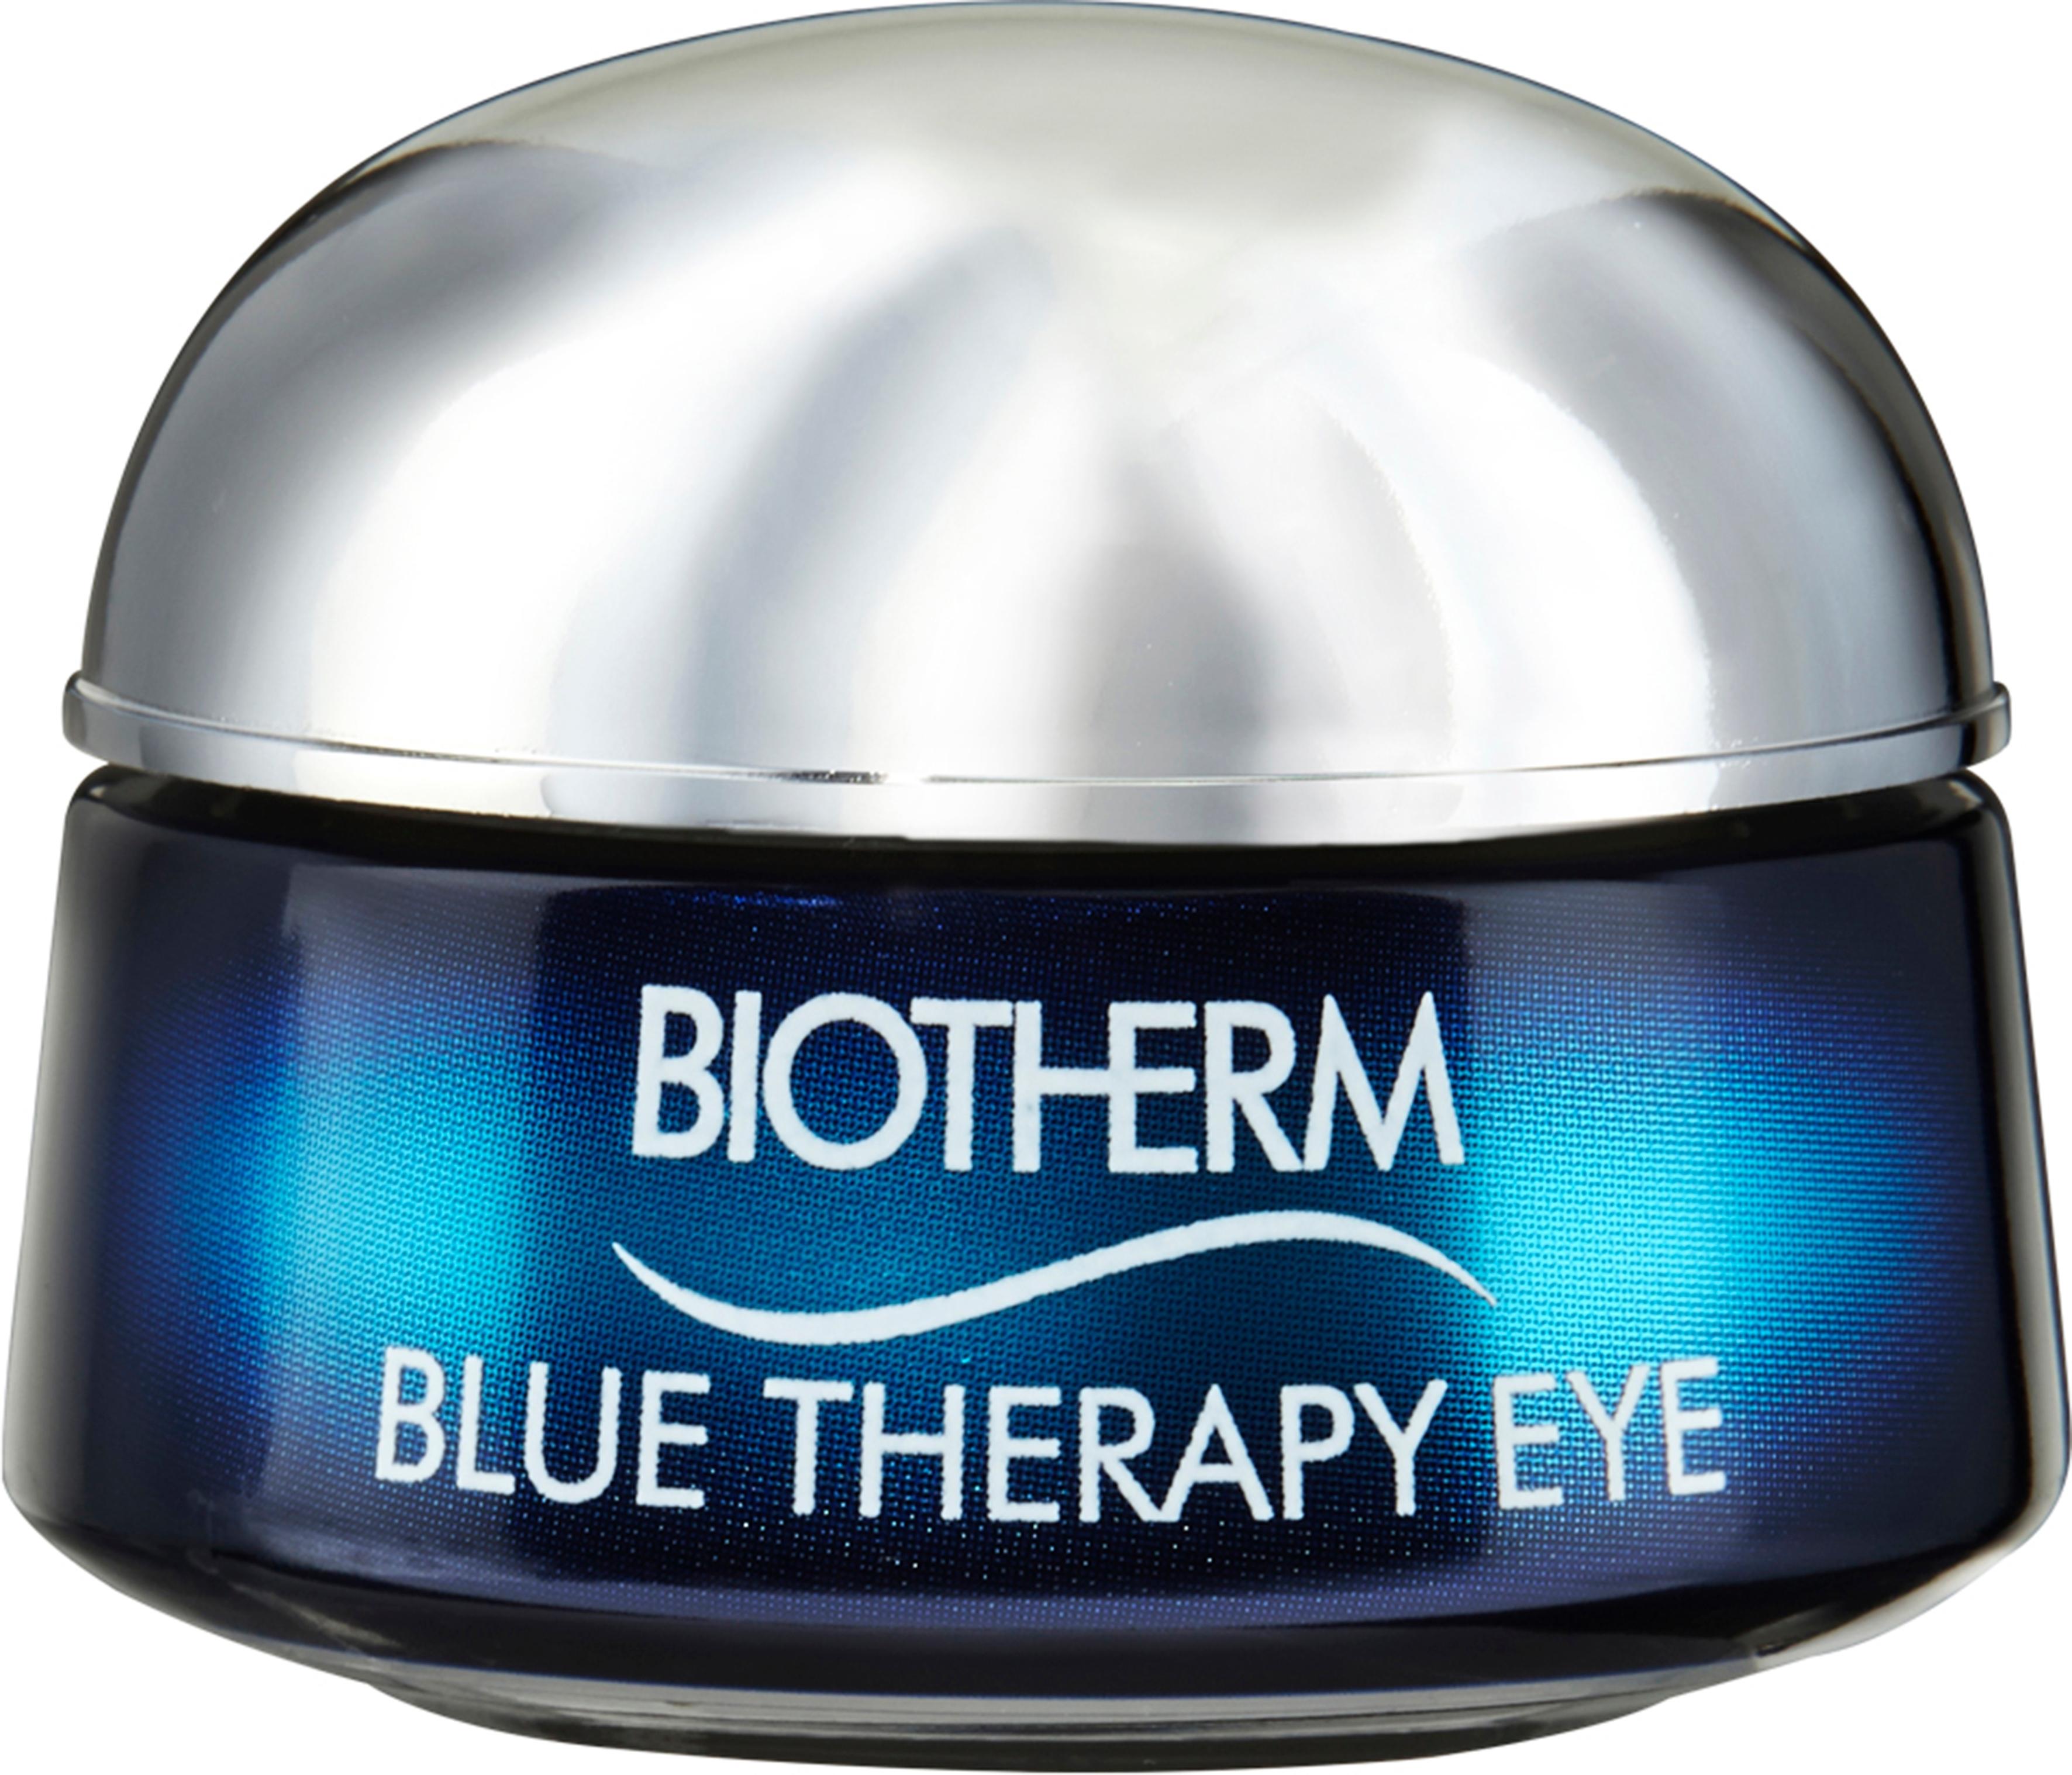 BIOTHERM oogcrème Blue Therapy Eye goedkoop op otto.nl kopen